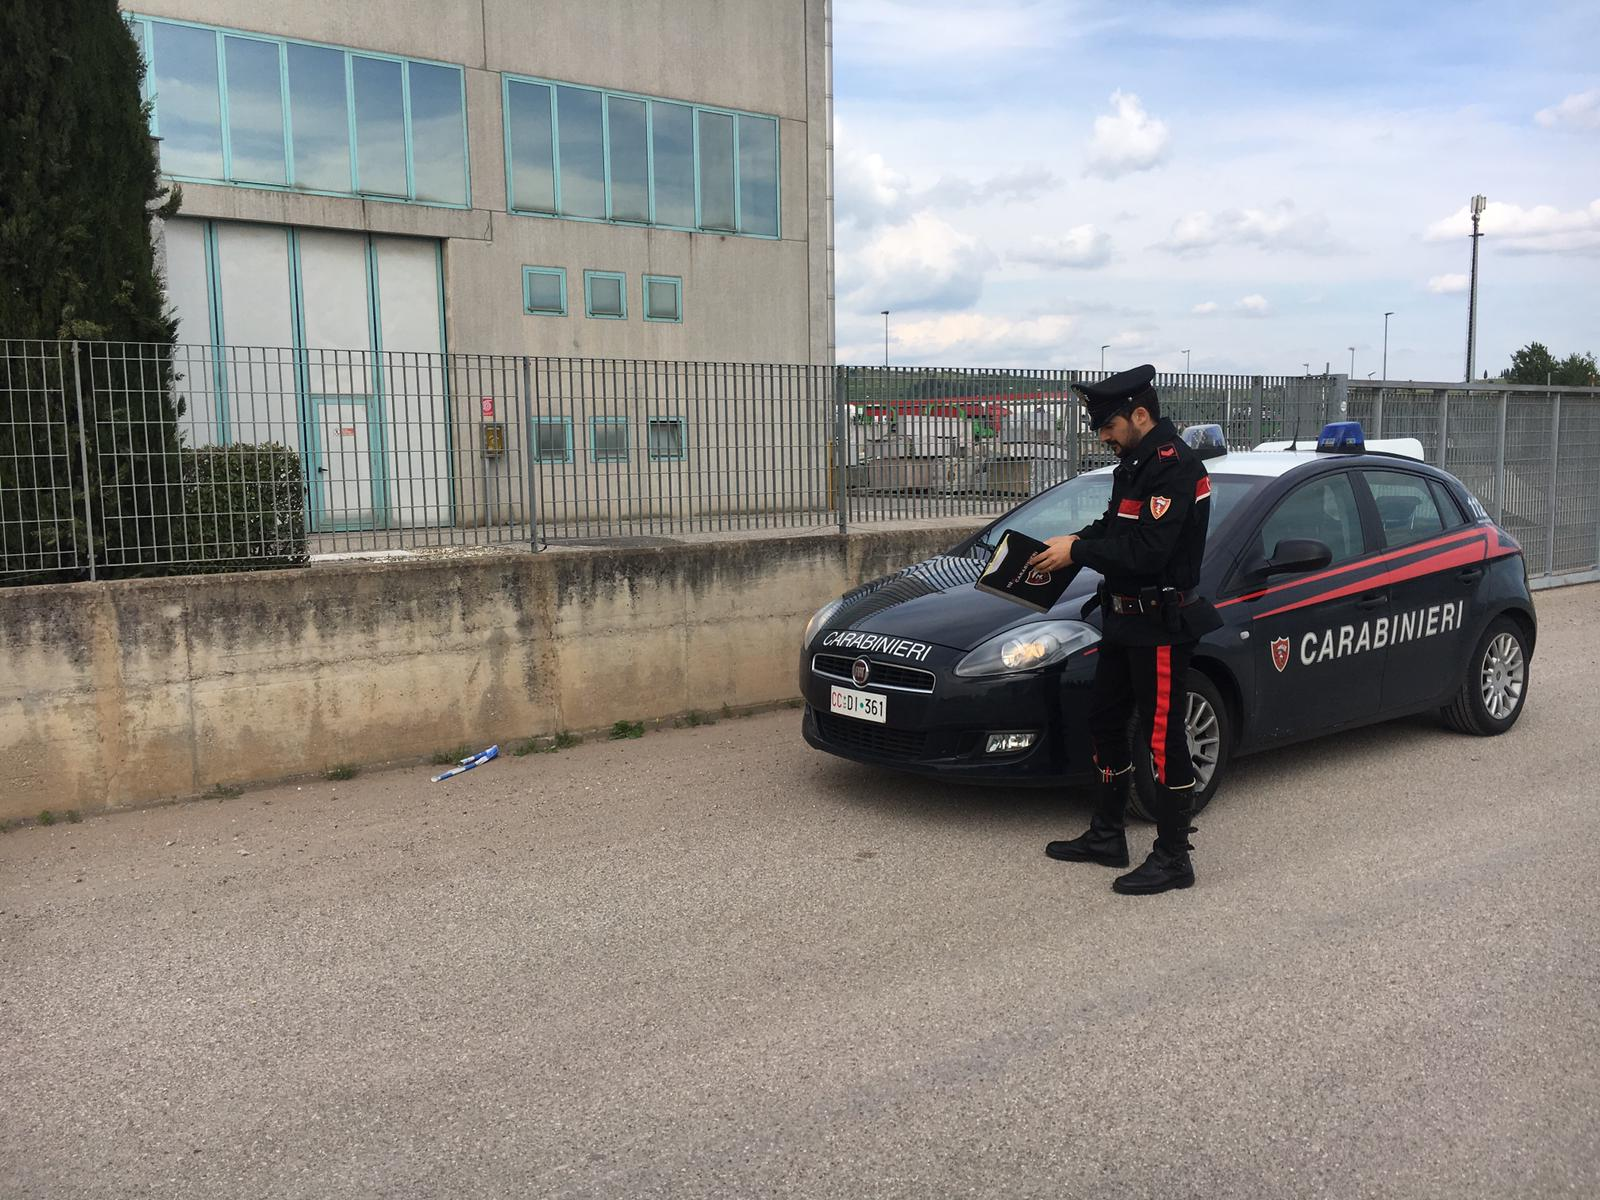 Carabinieri soave incidente lavoro